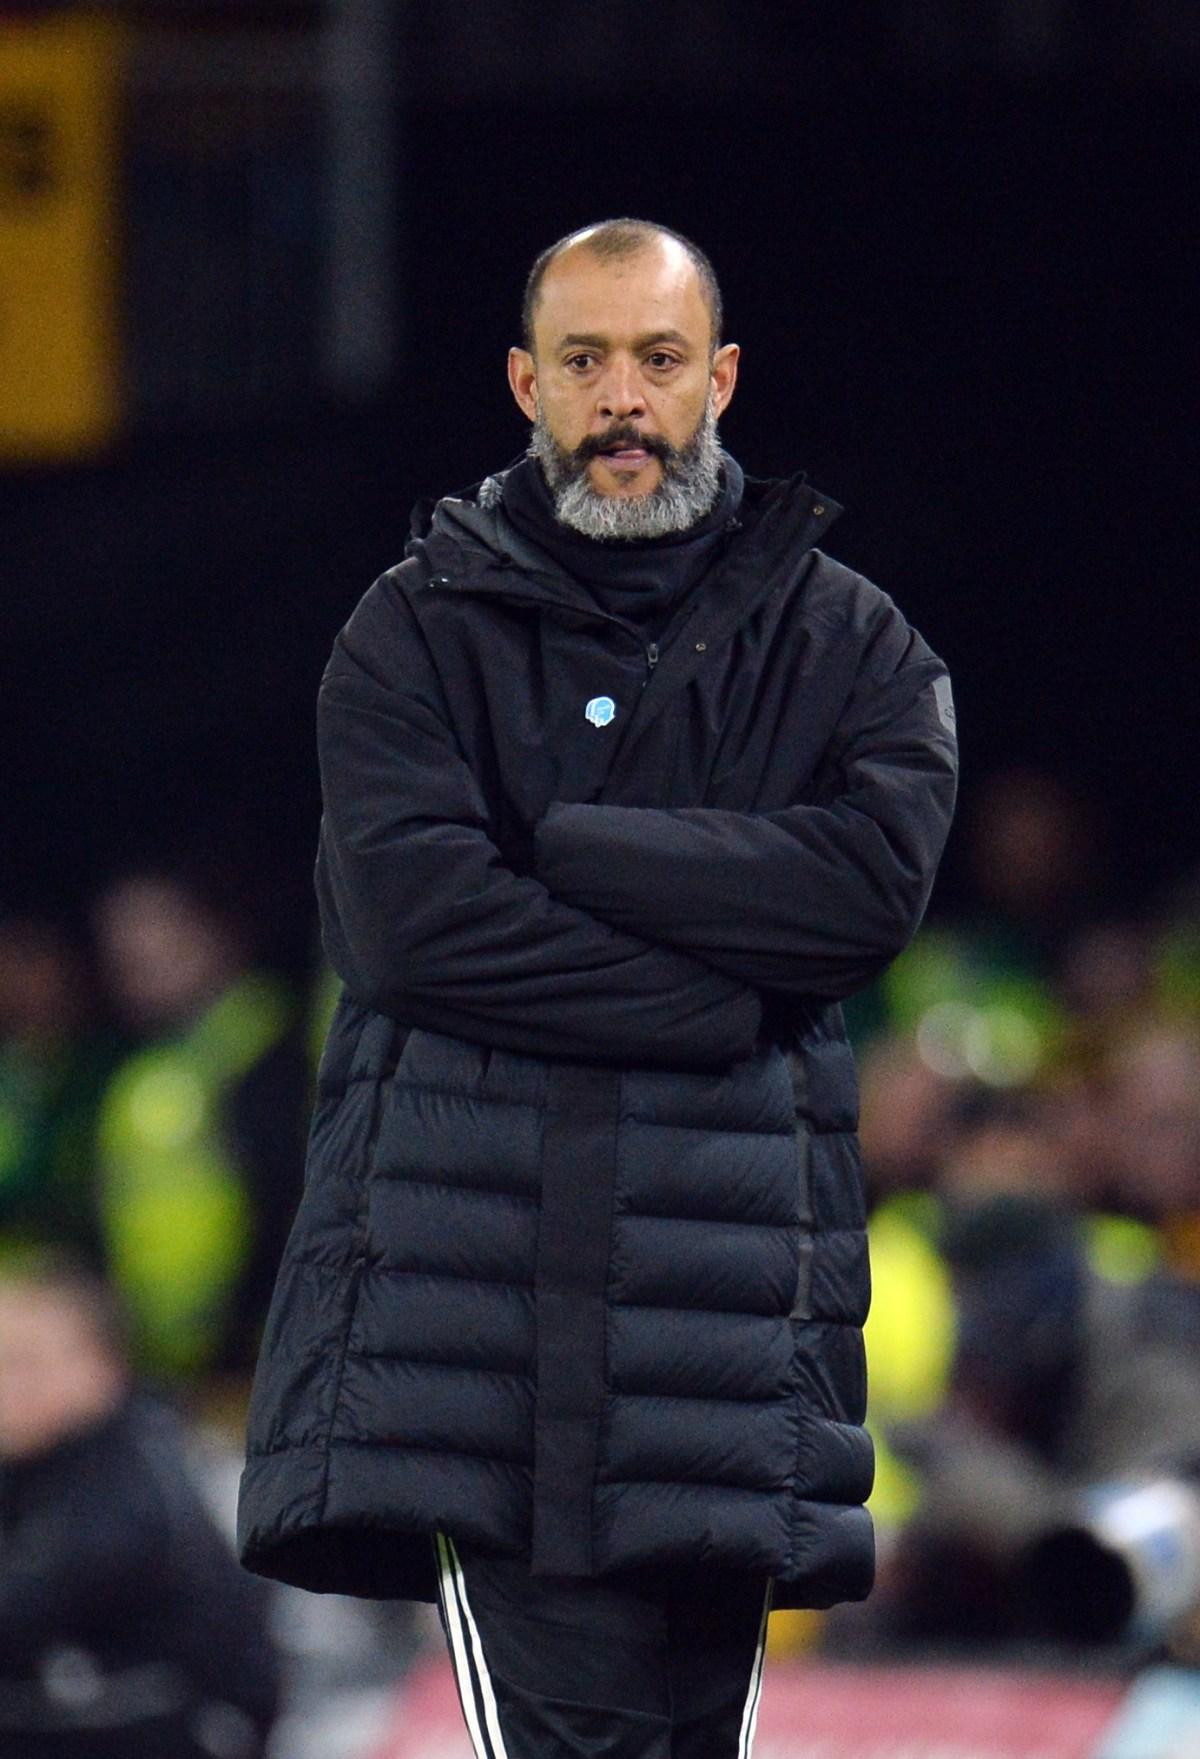 Nuno Esprito Santo has turned Wolves catastrophes into fortunes